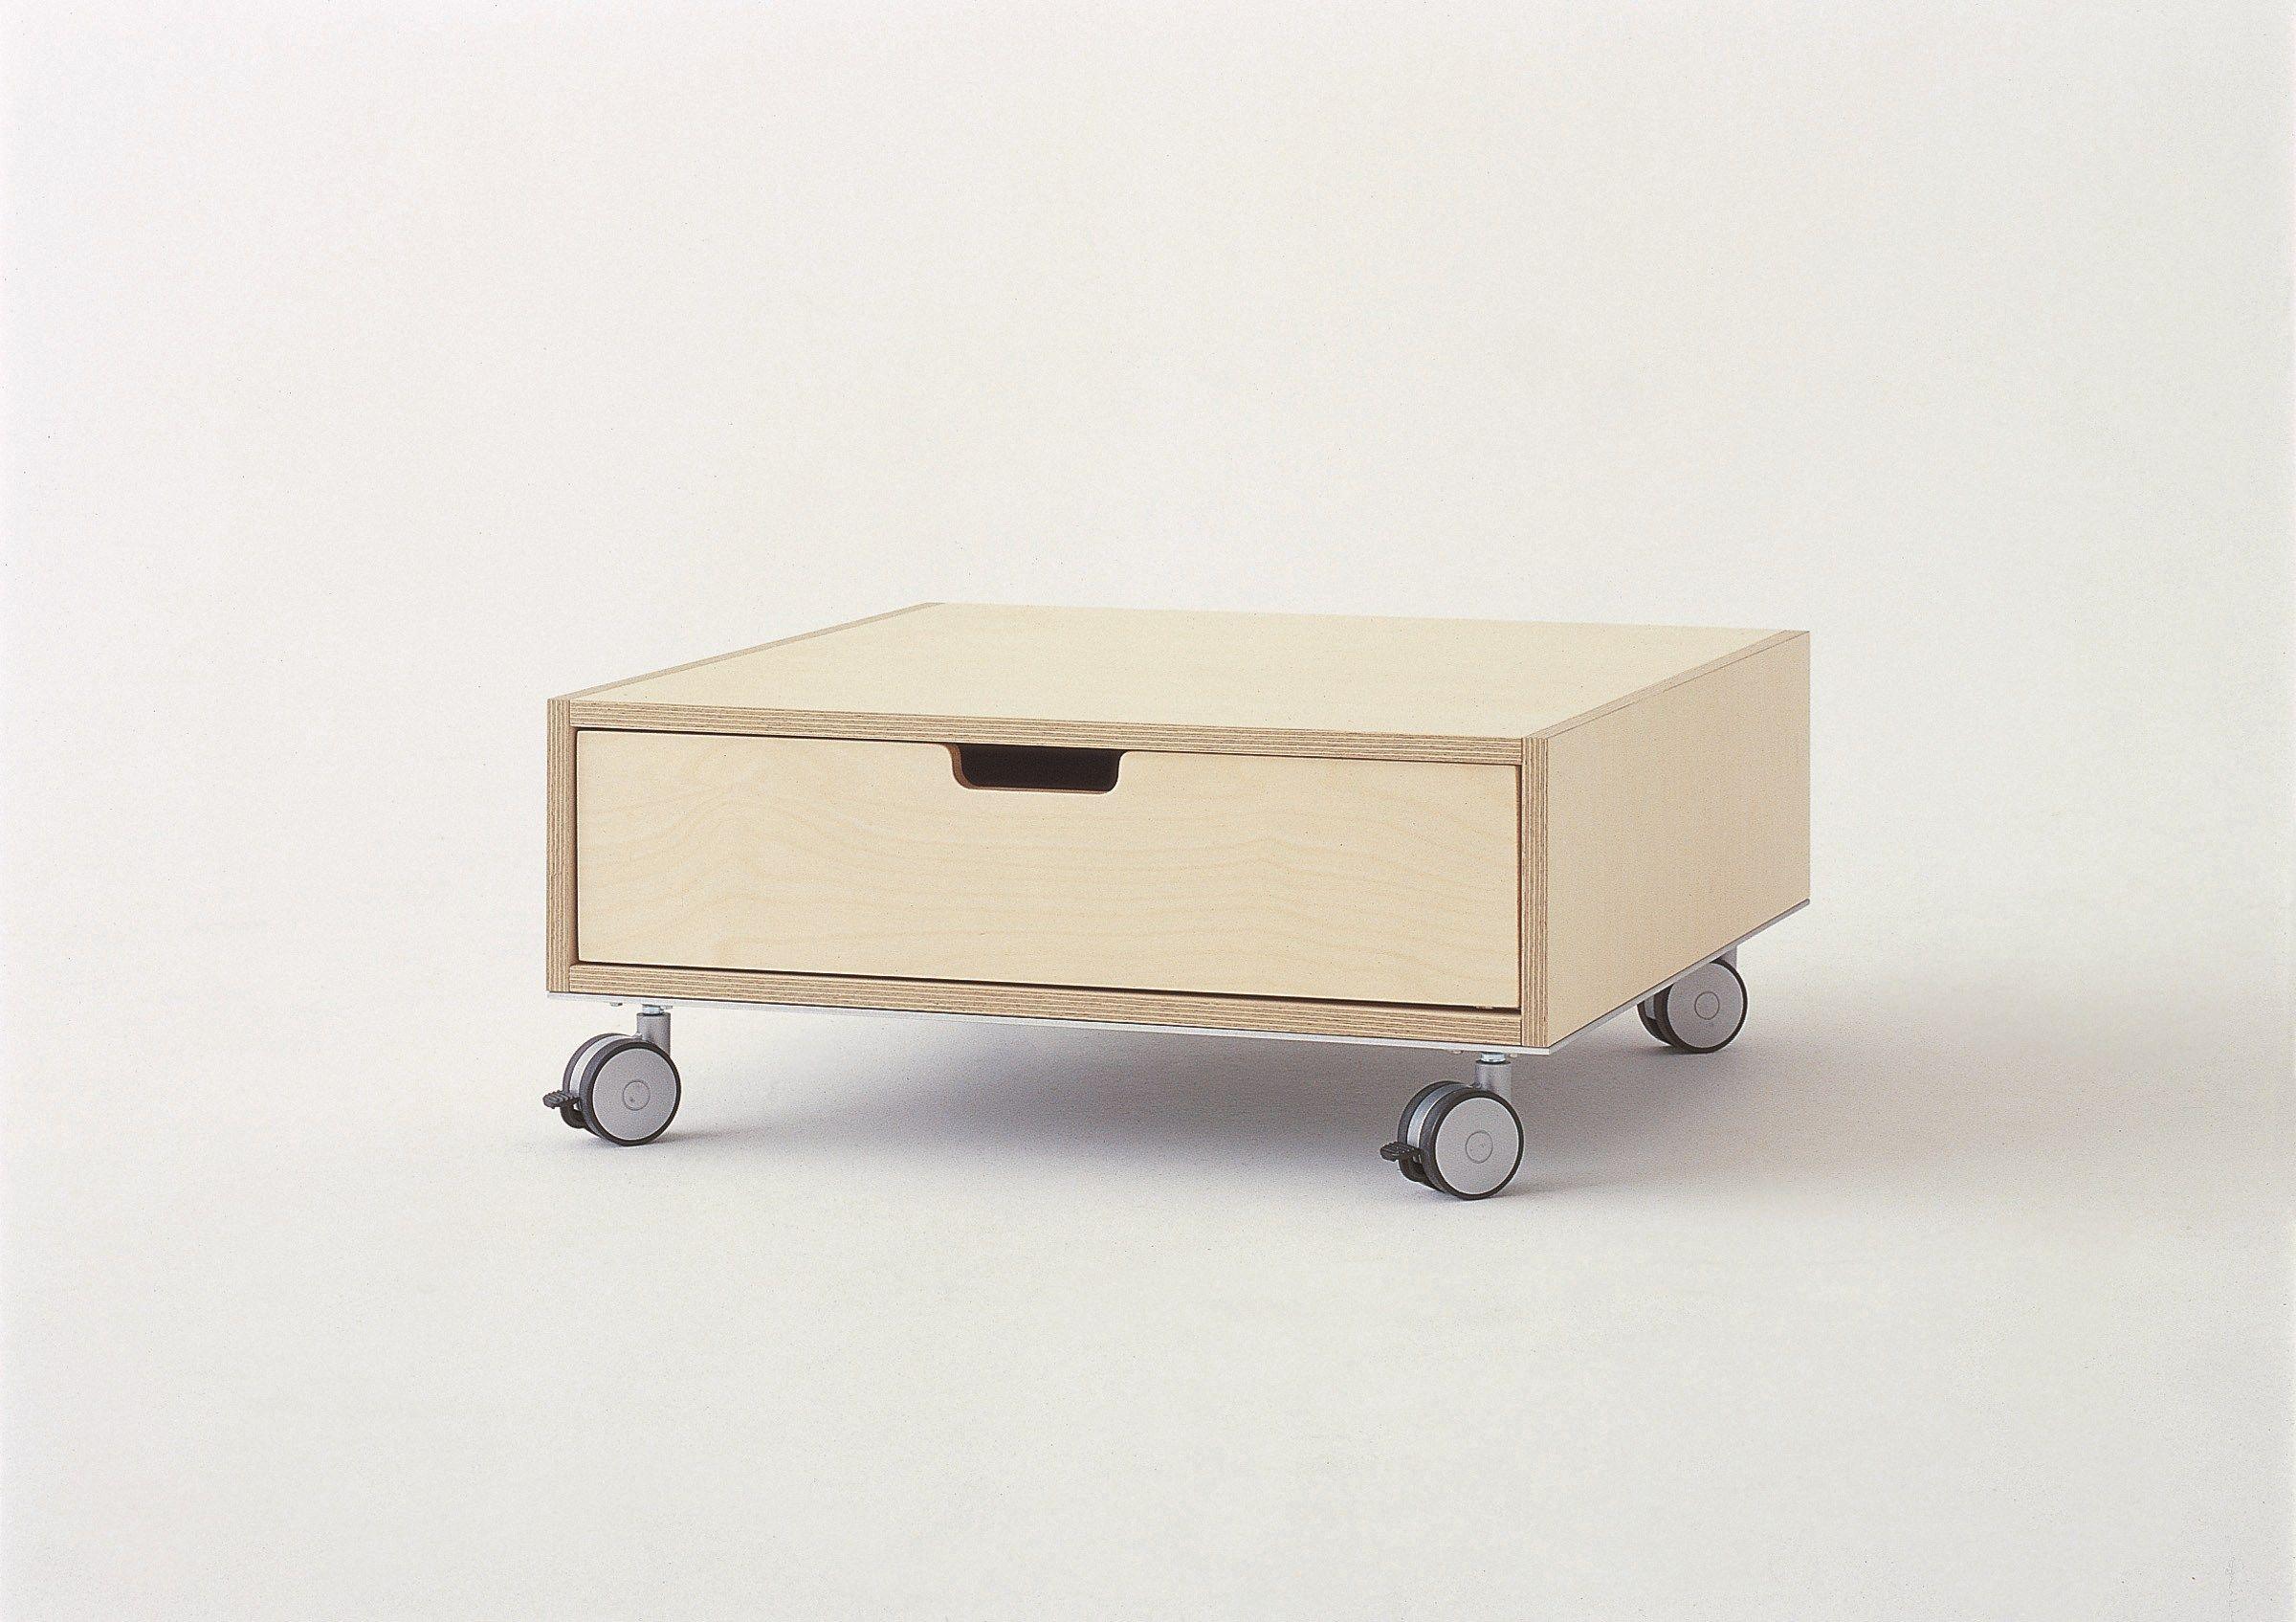 anbau kleiderschrank by m ller m belwerkst tten design rolf heide. Black Bedroom Furniture Sets. Home Design Ideas